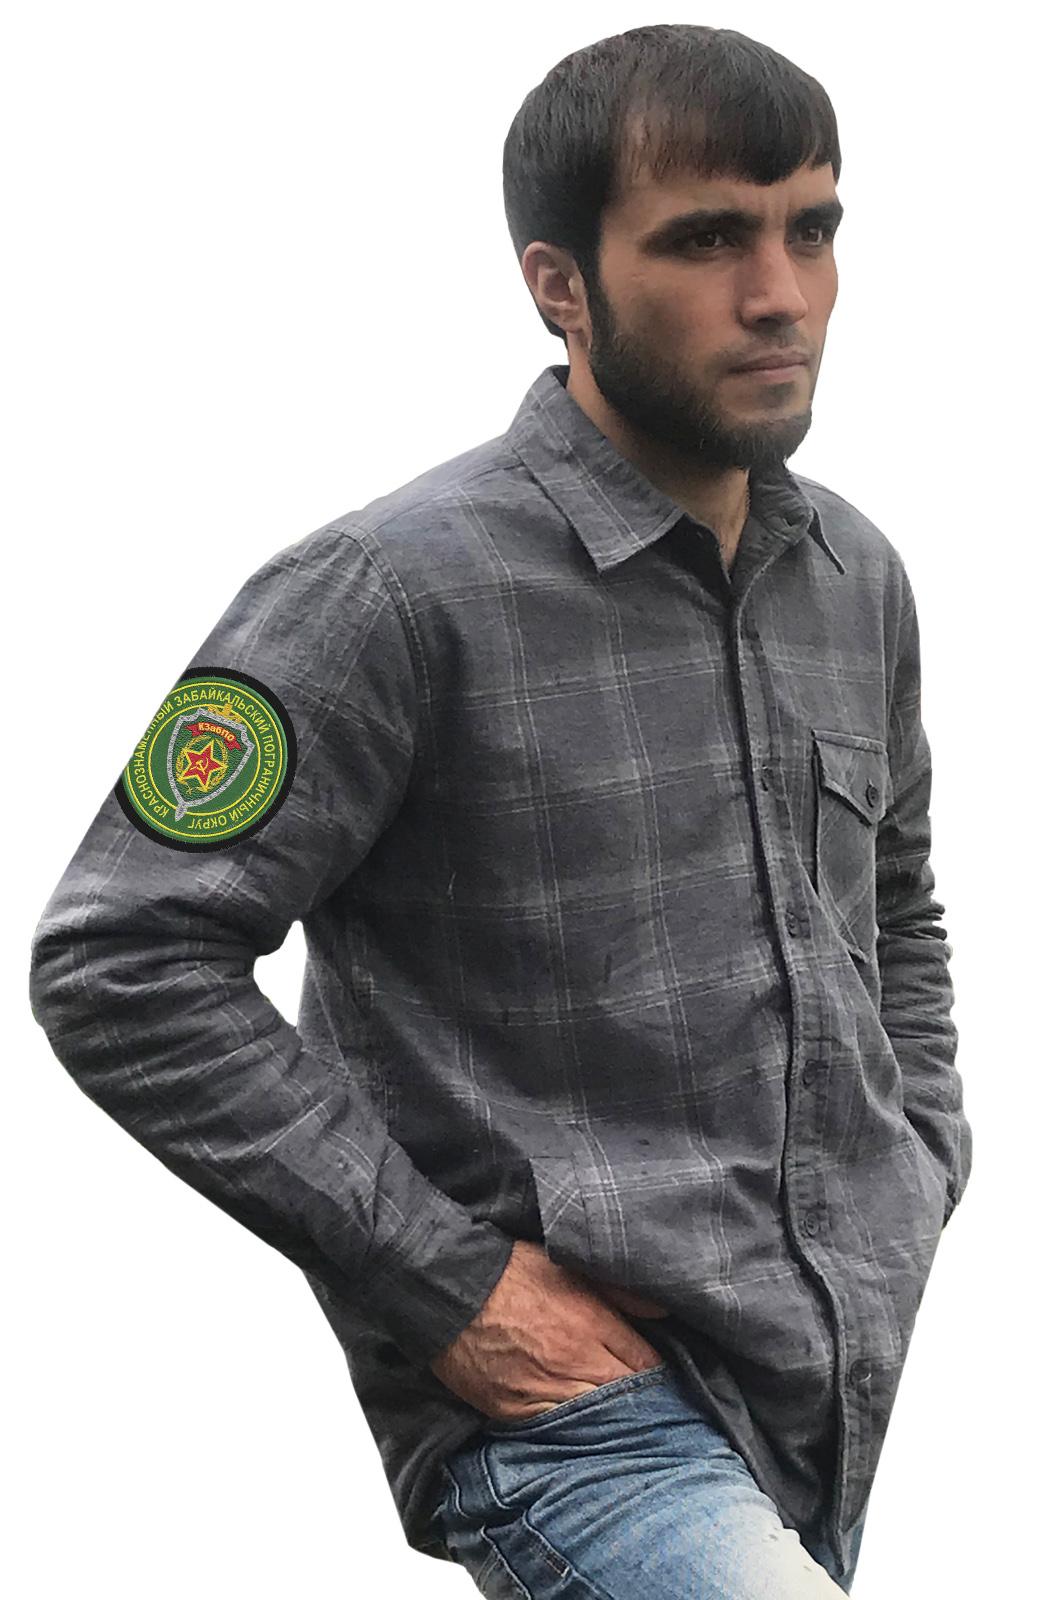 Зачетная рубашка КЗабПО